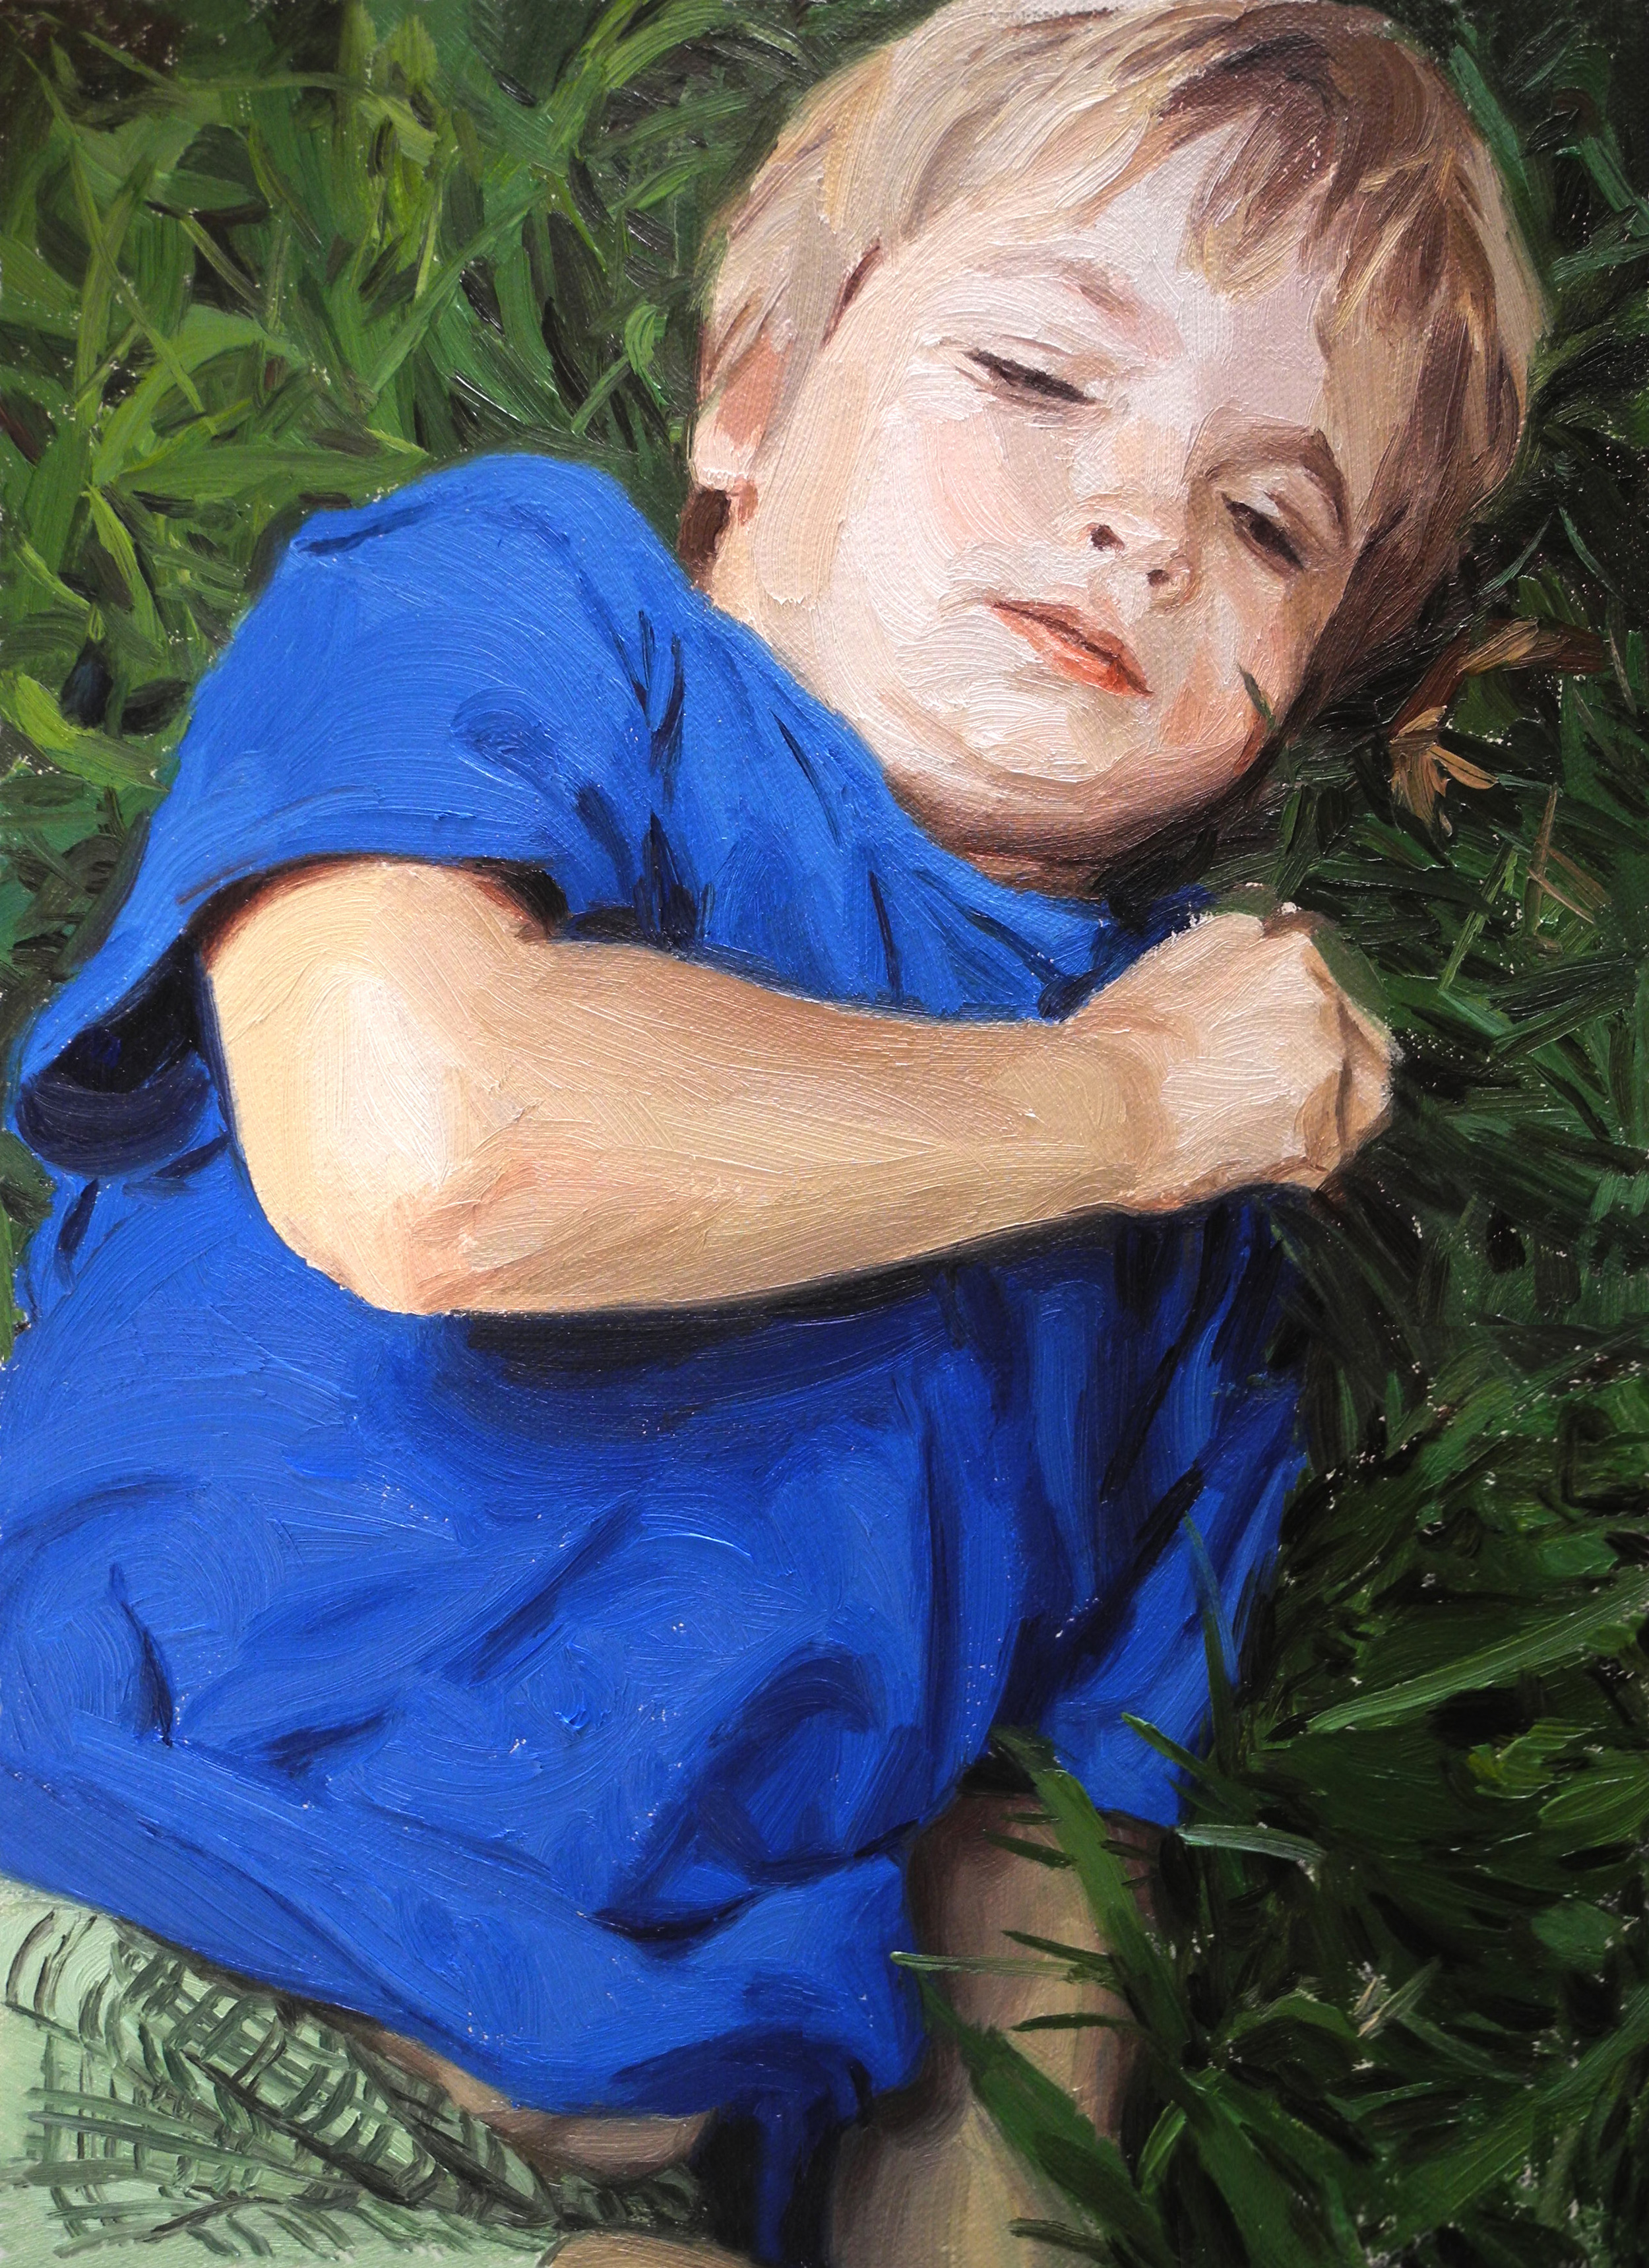 BOY ON GRASS